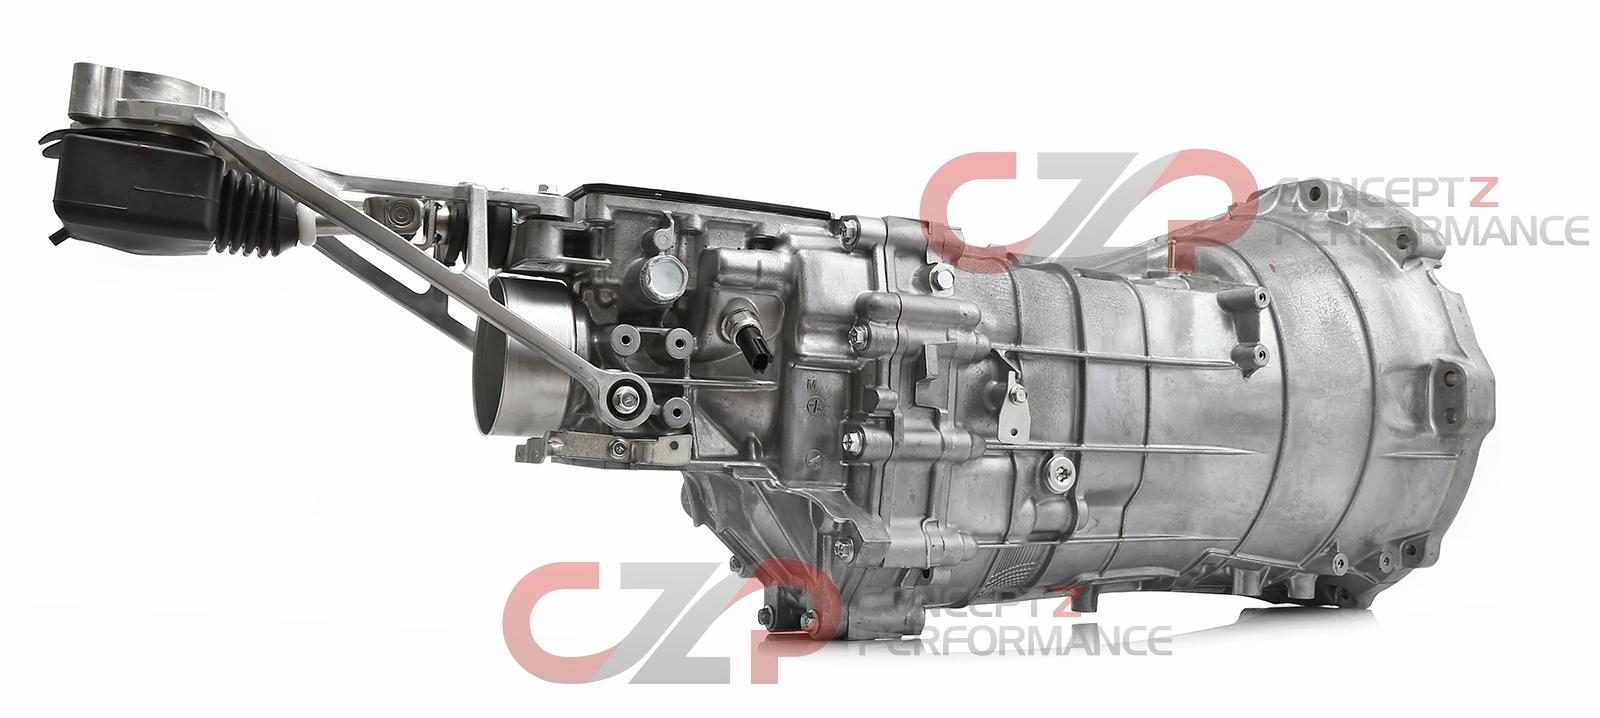 nissan frontier manual transmission swap